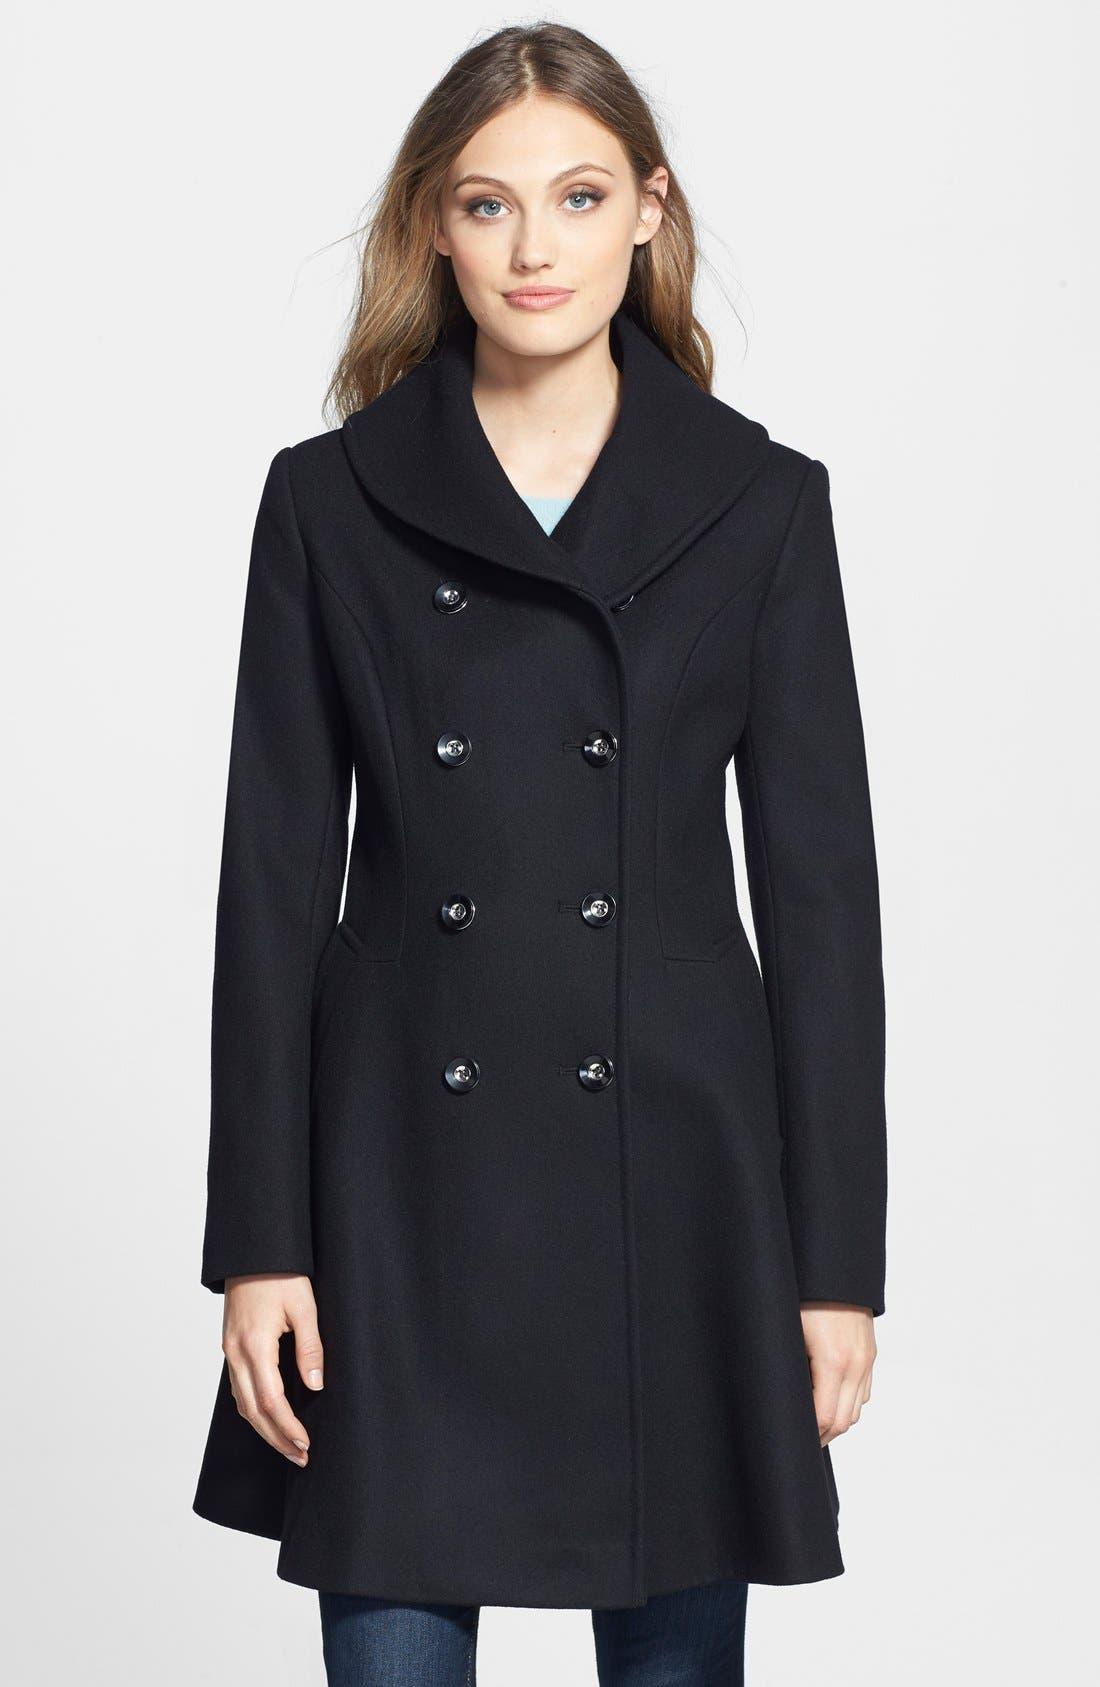 Skirted Wool Blend Coat, Main, color, 001